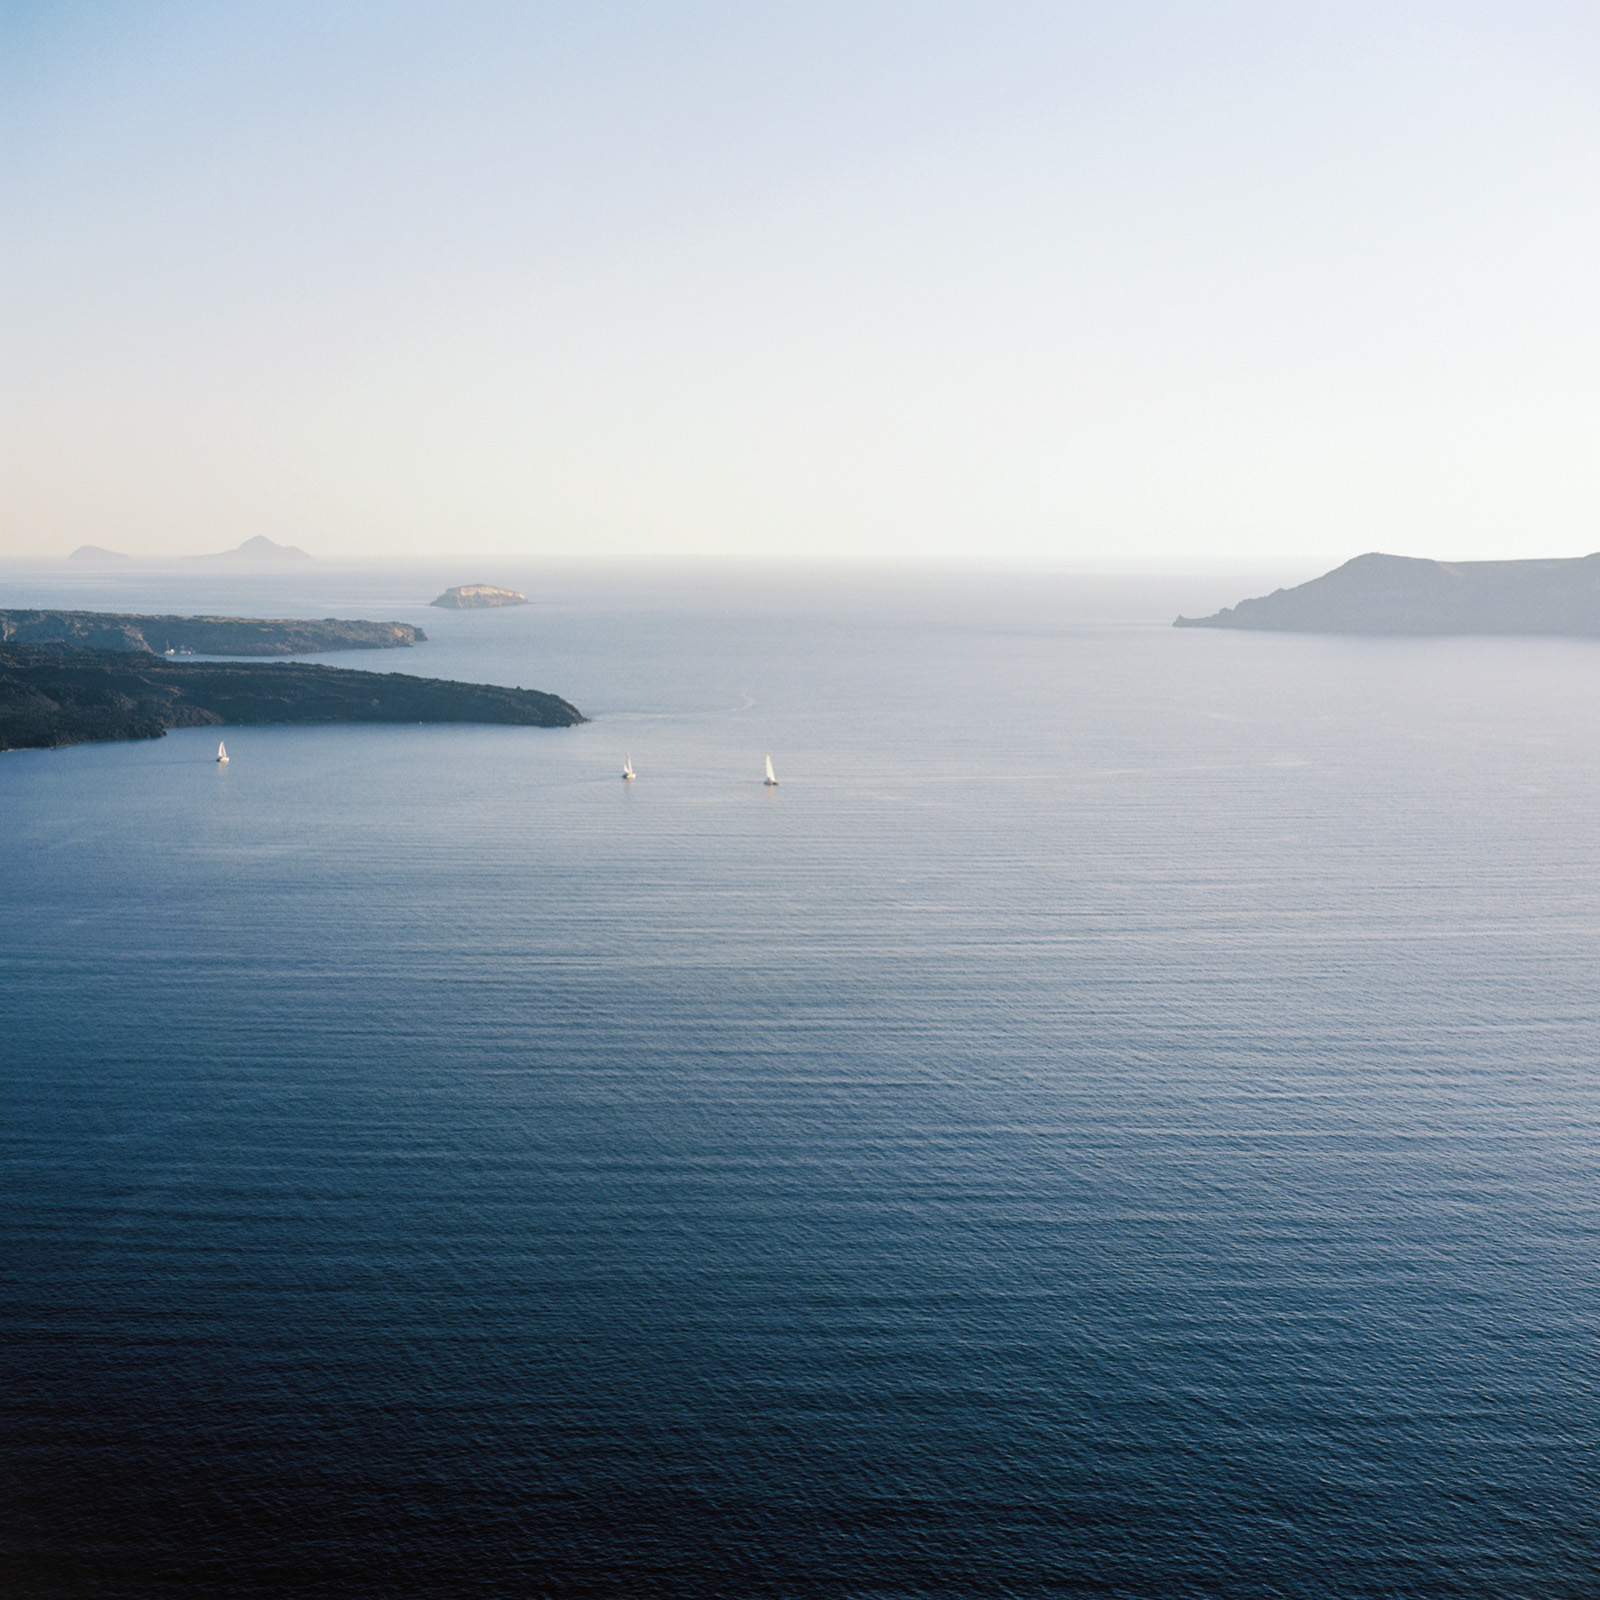 Greece_Yashicamat124g_07.jpg